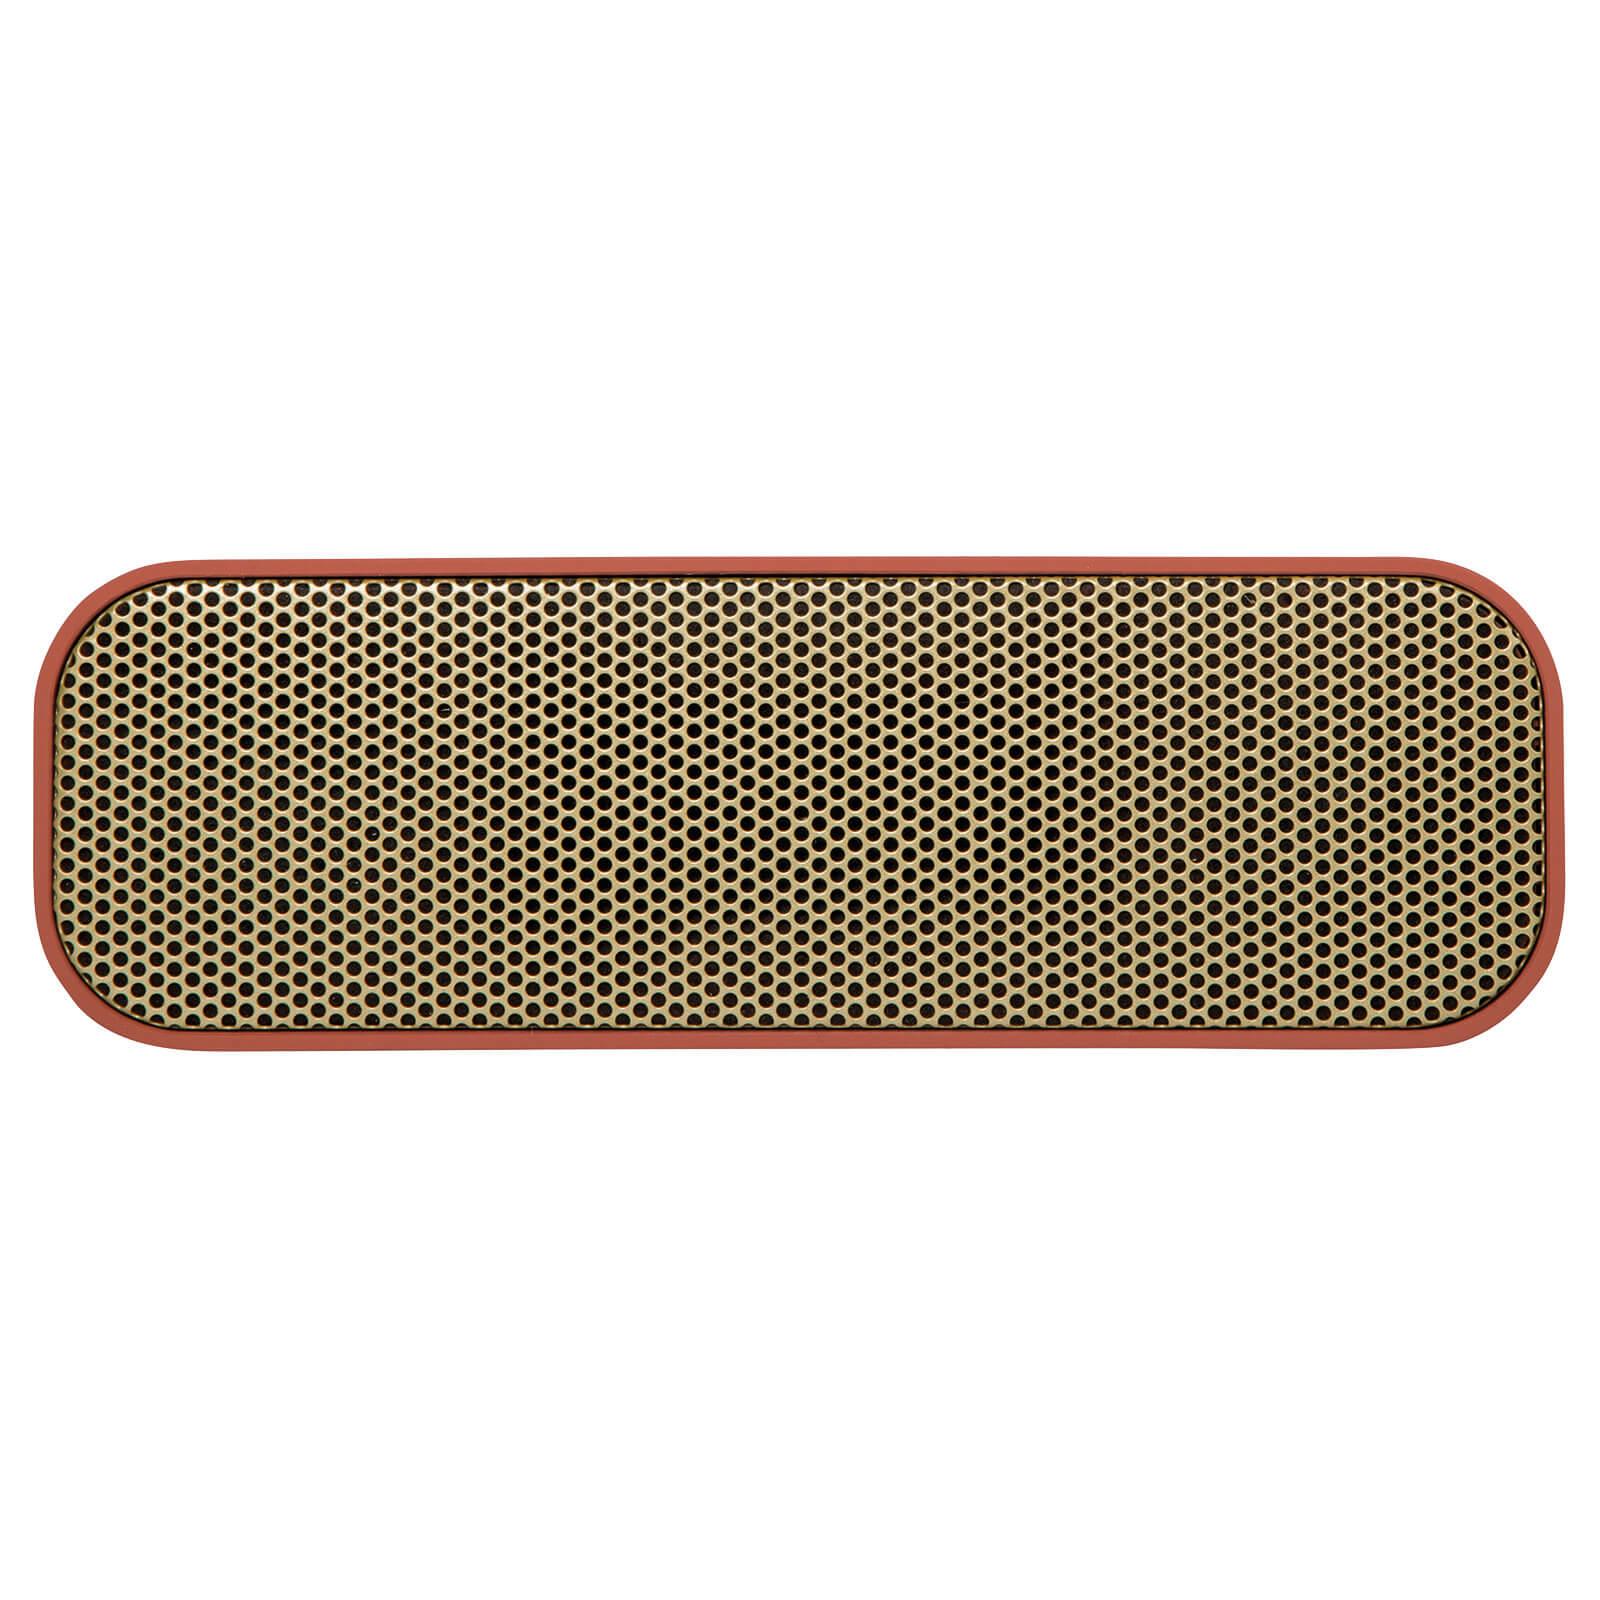 Kreafunk aGROOVE Bluetooth Speaker - Soft Coral/Gold